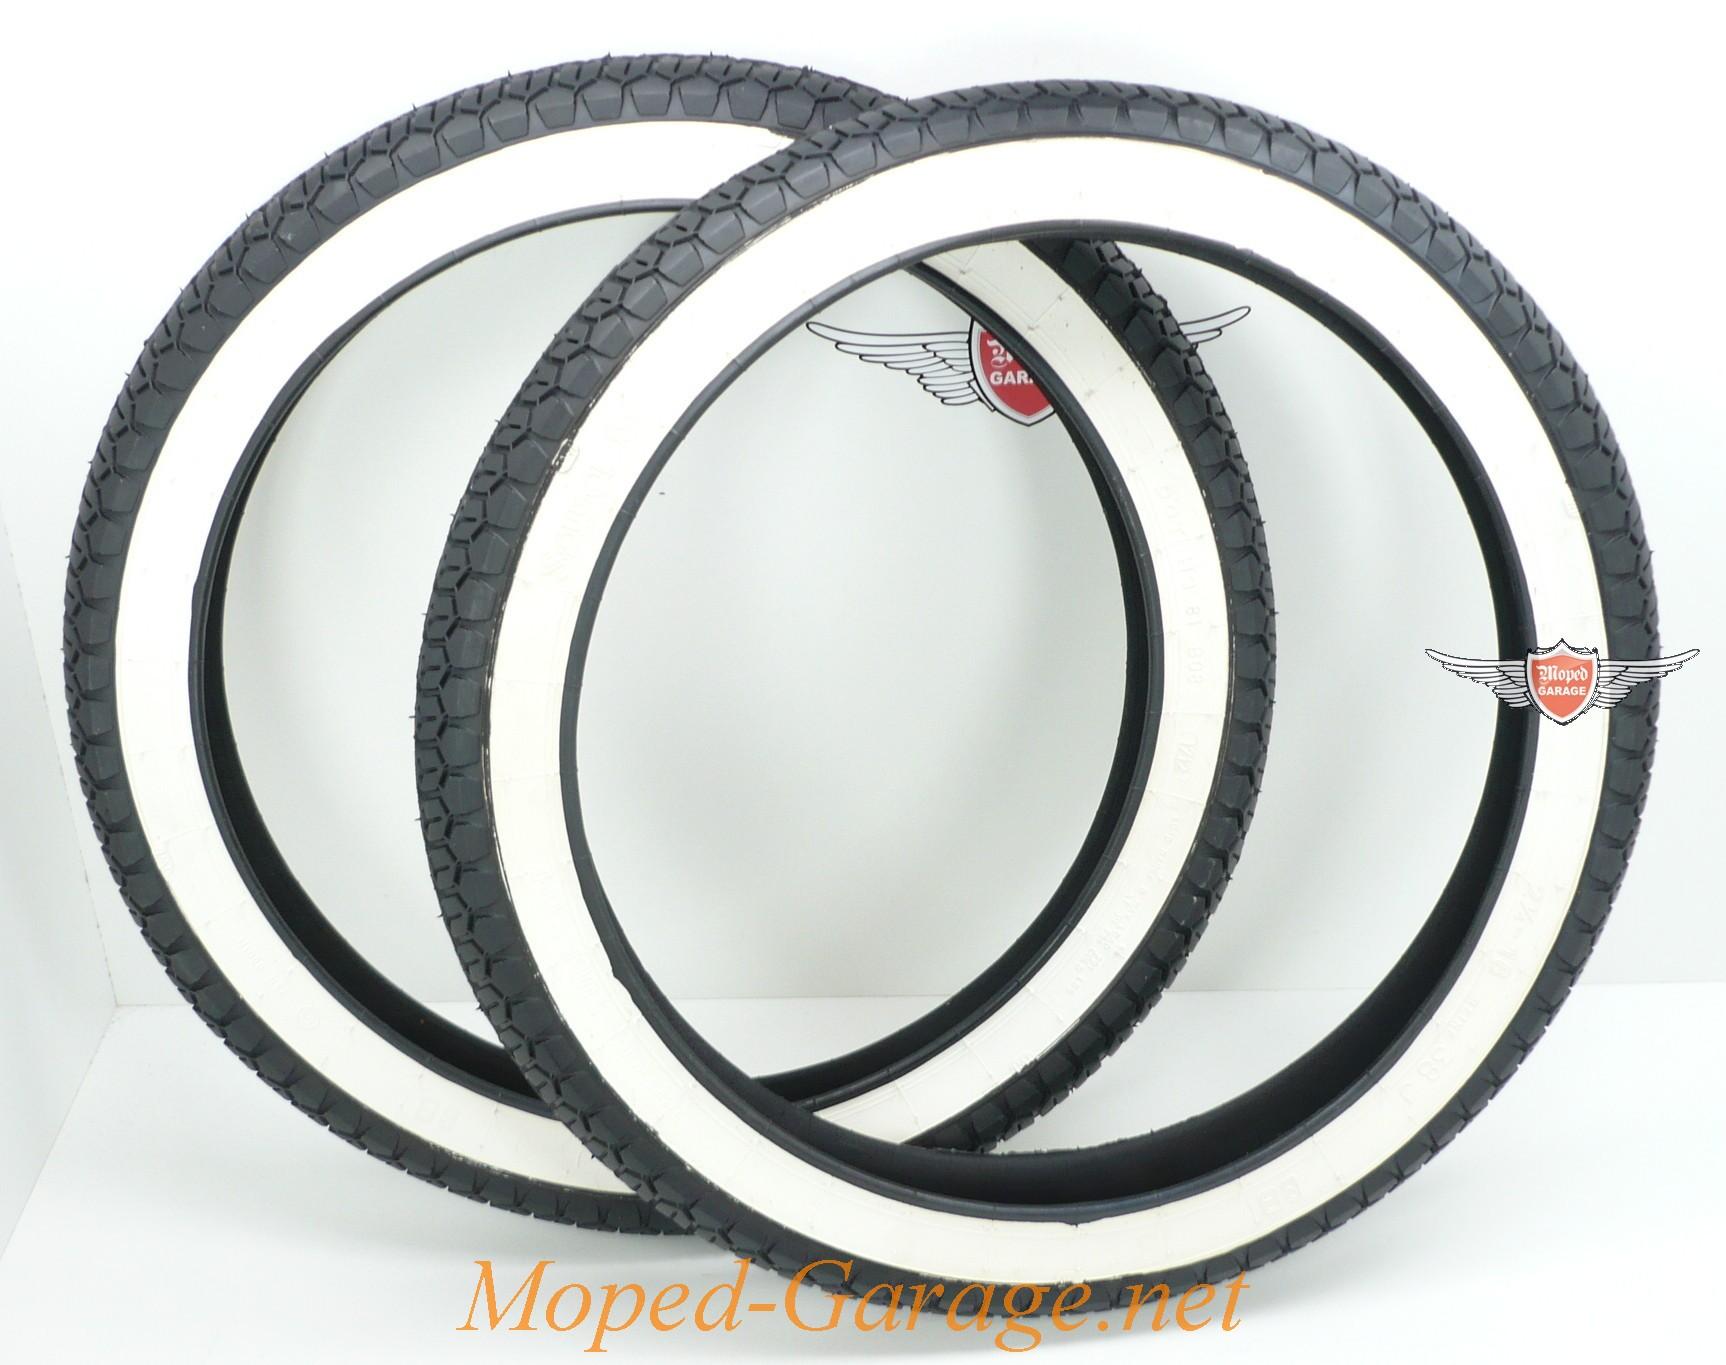 moped mofa moped mokick sava 2 1 4x 16 zoll. Black Bedroom Furniture Sets. Home Design Ideas